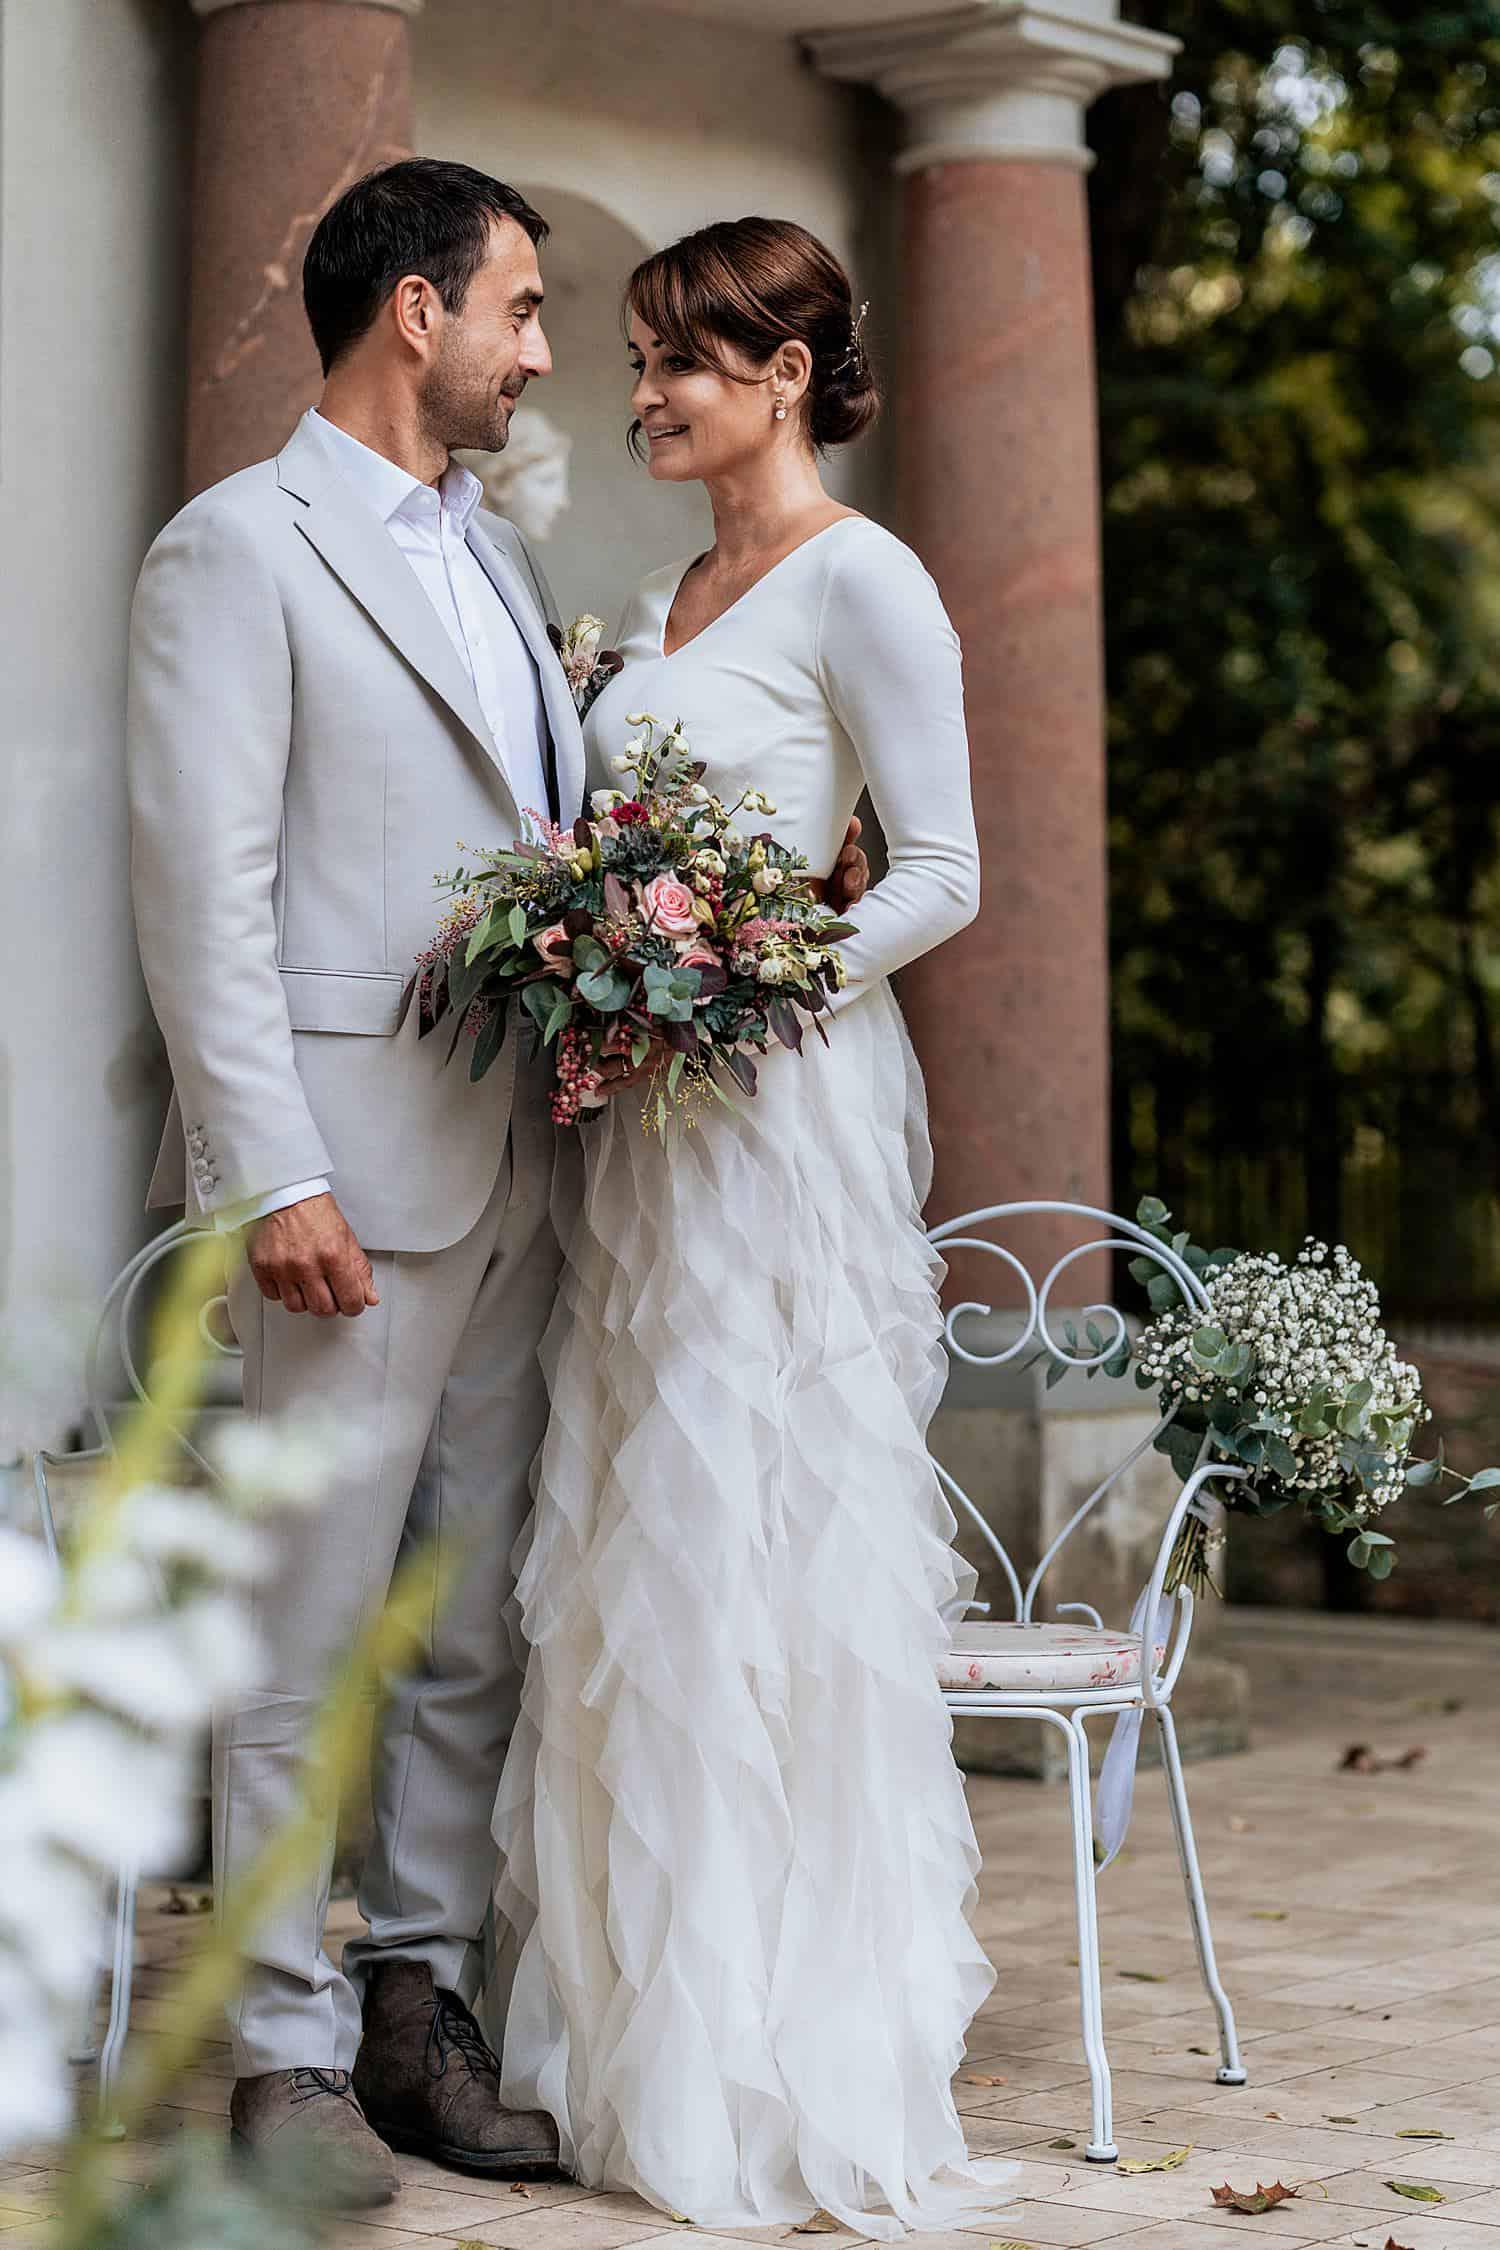 Anja Kling Hochzeit Hochzeitsfotograf BErlin Vasil Bituni